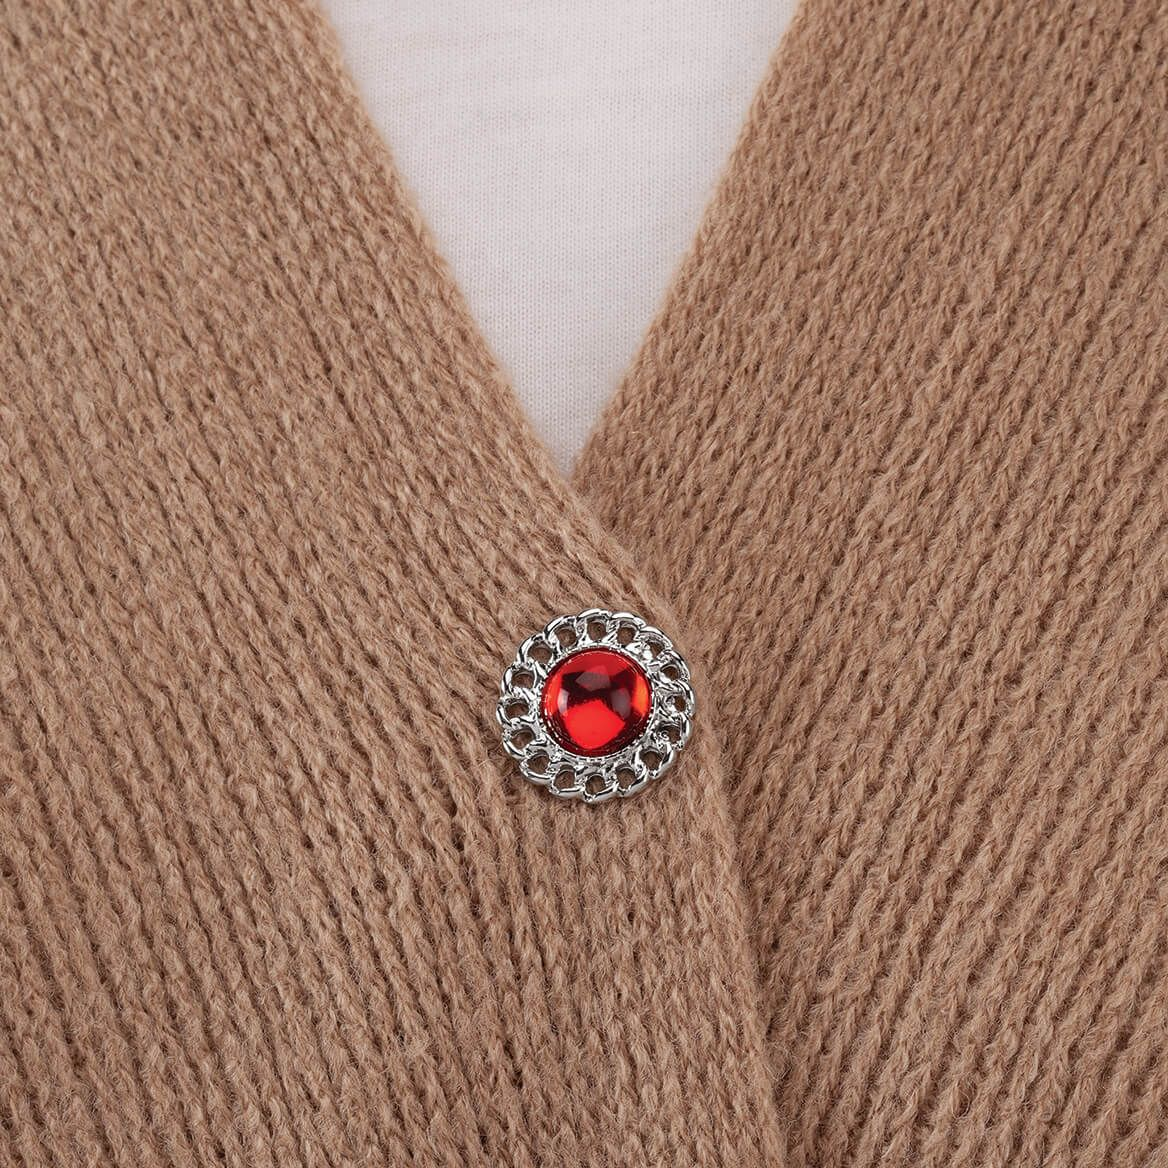 Decorative Accent Pins, Set of 5-371211